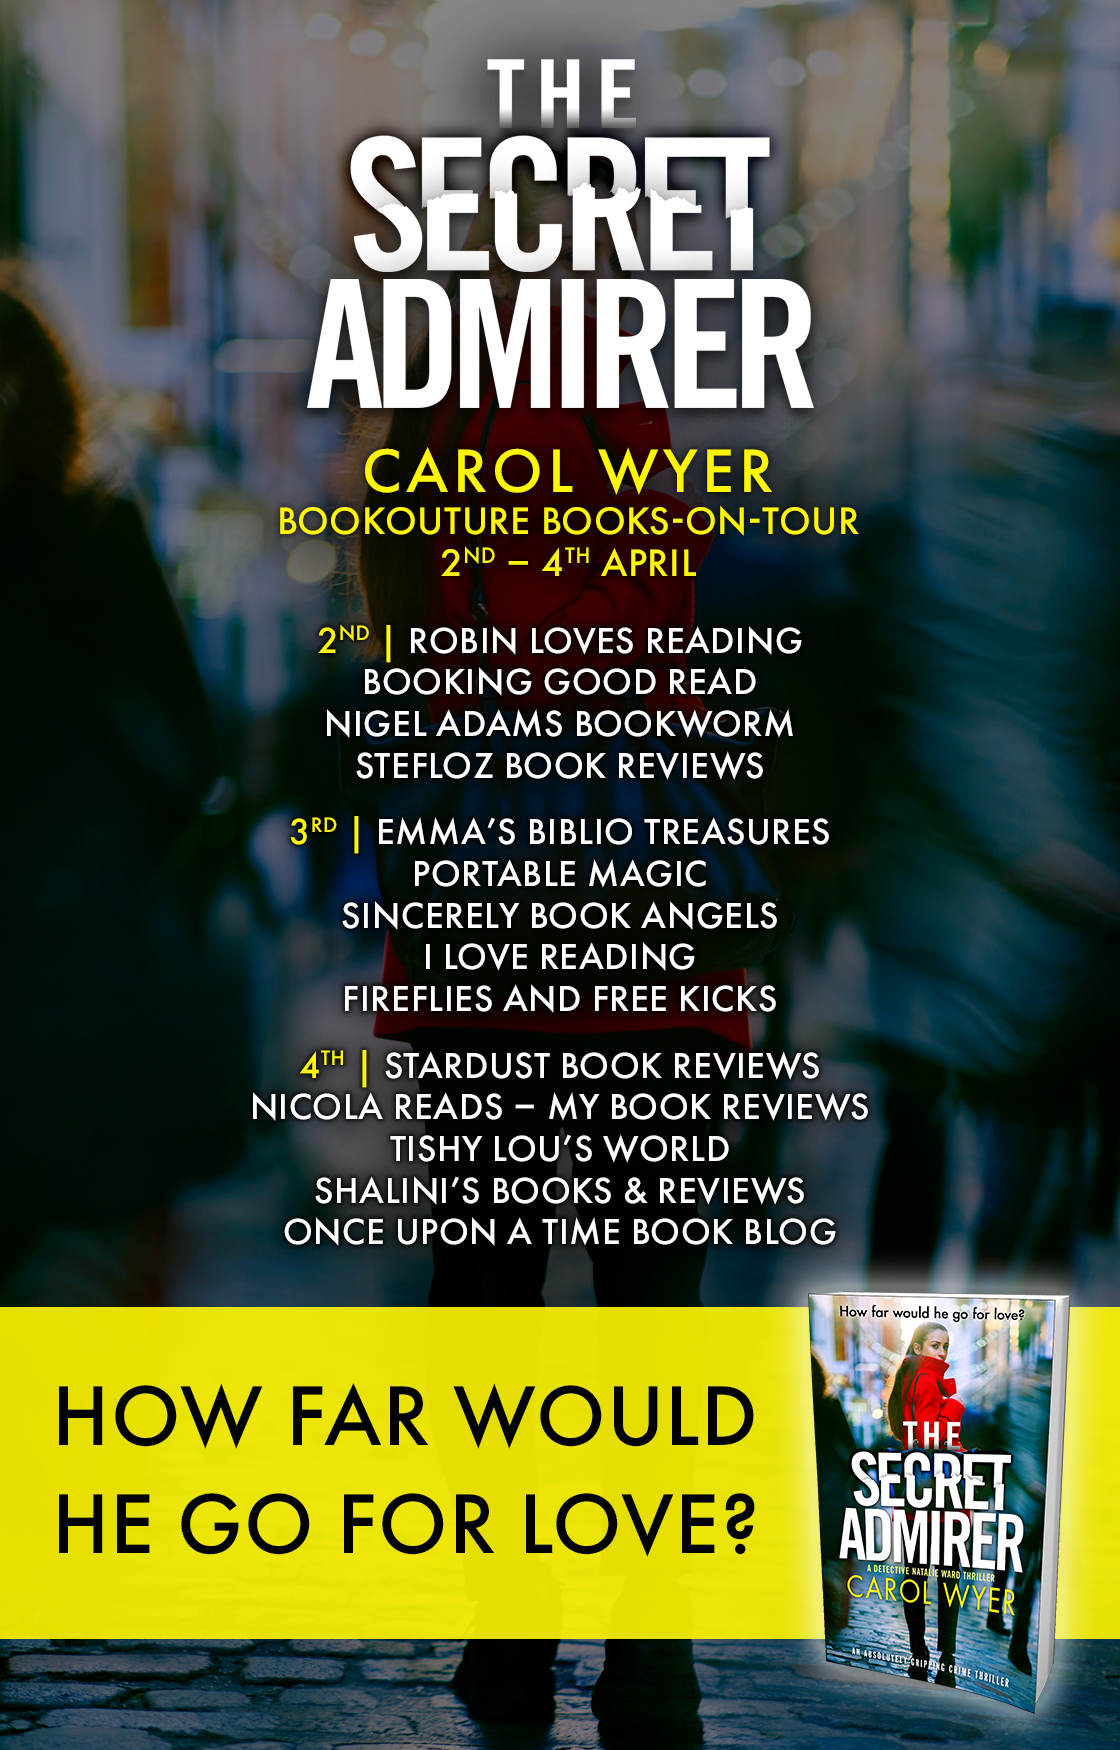 The Sexret Admirer - Blog Tour Poster